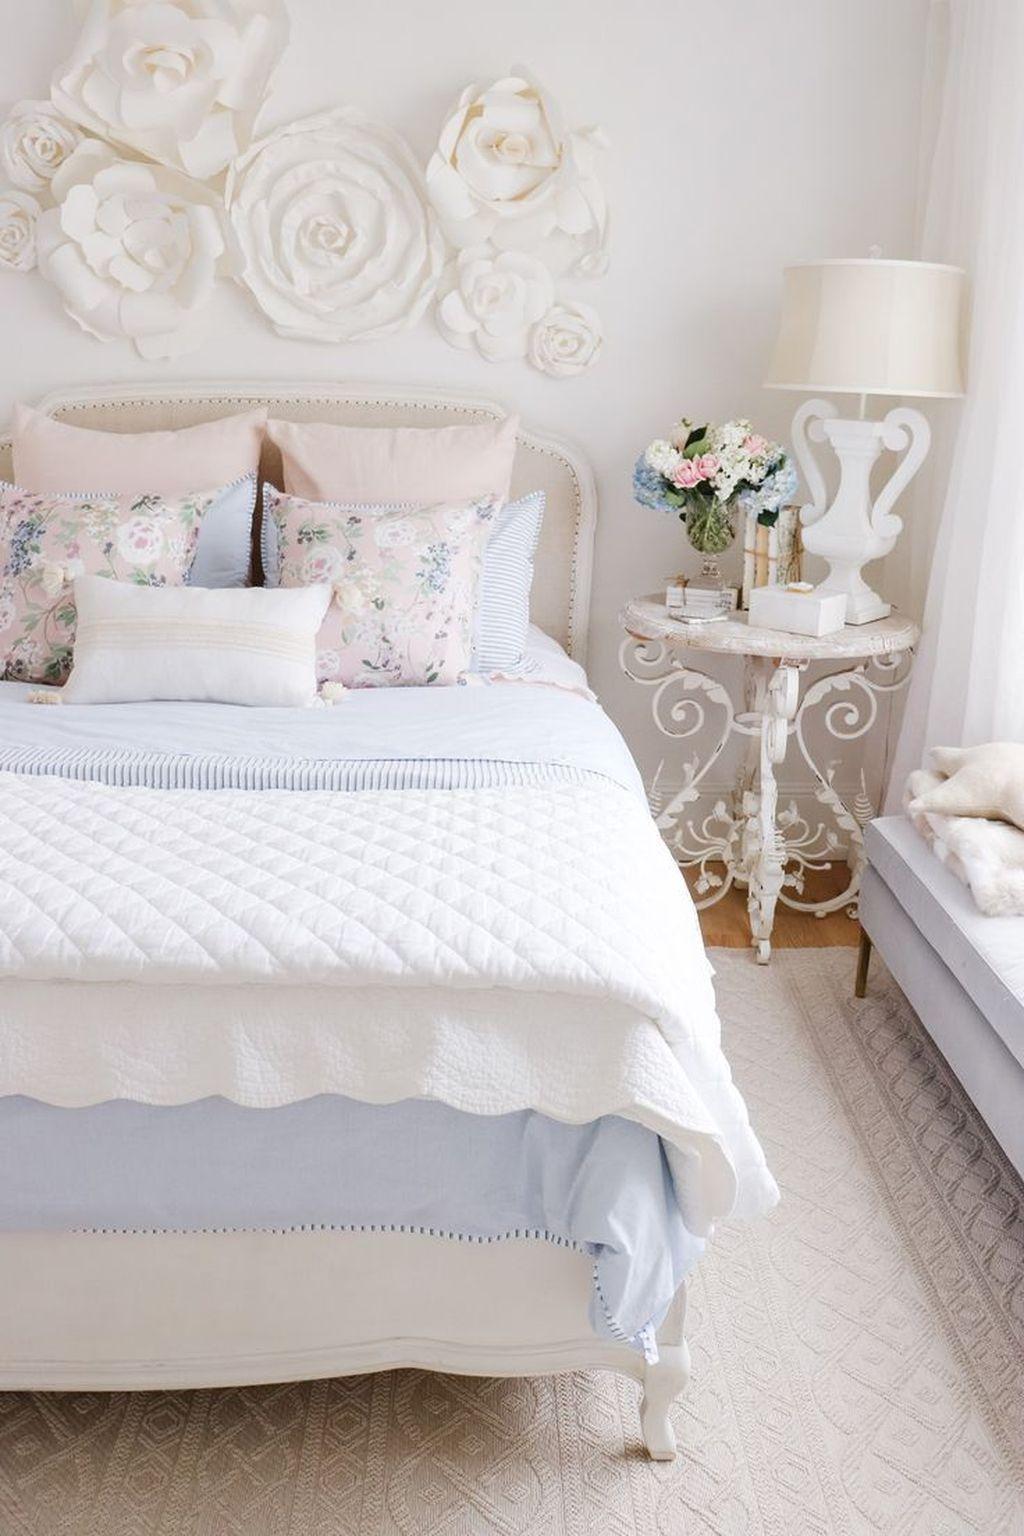 Lovely Spring Bedroom Decor Ideas Trending This Year 36